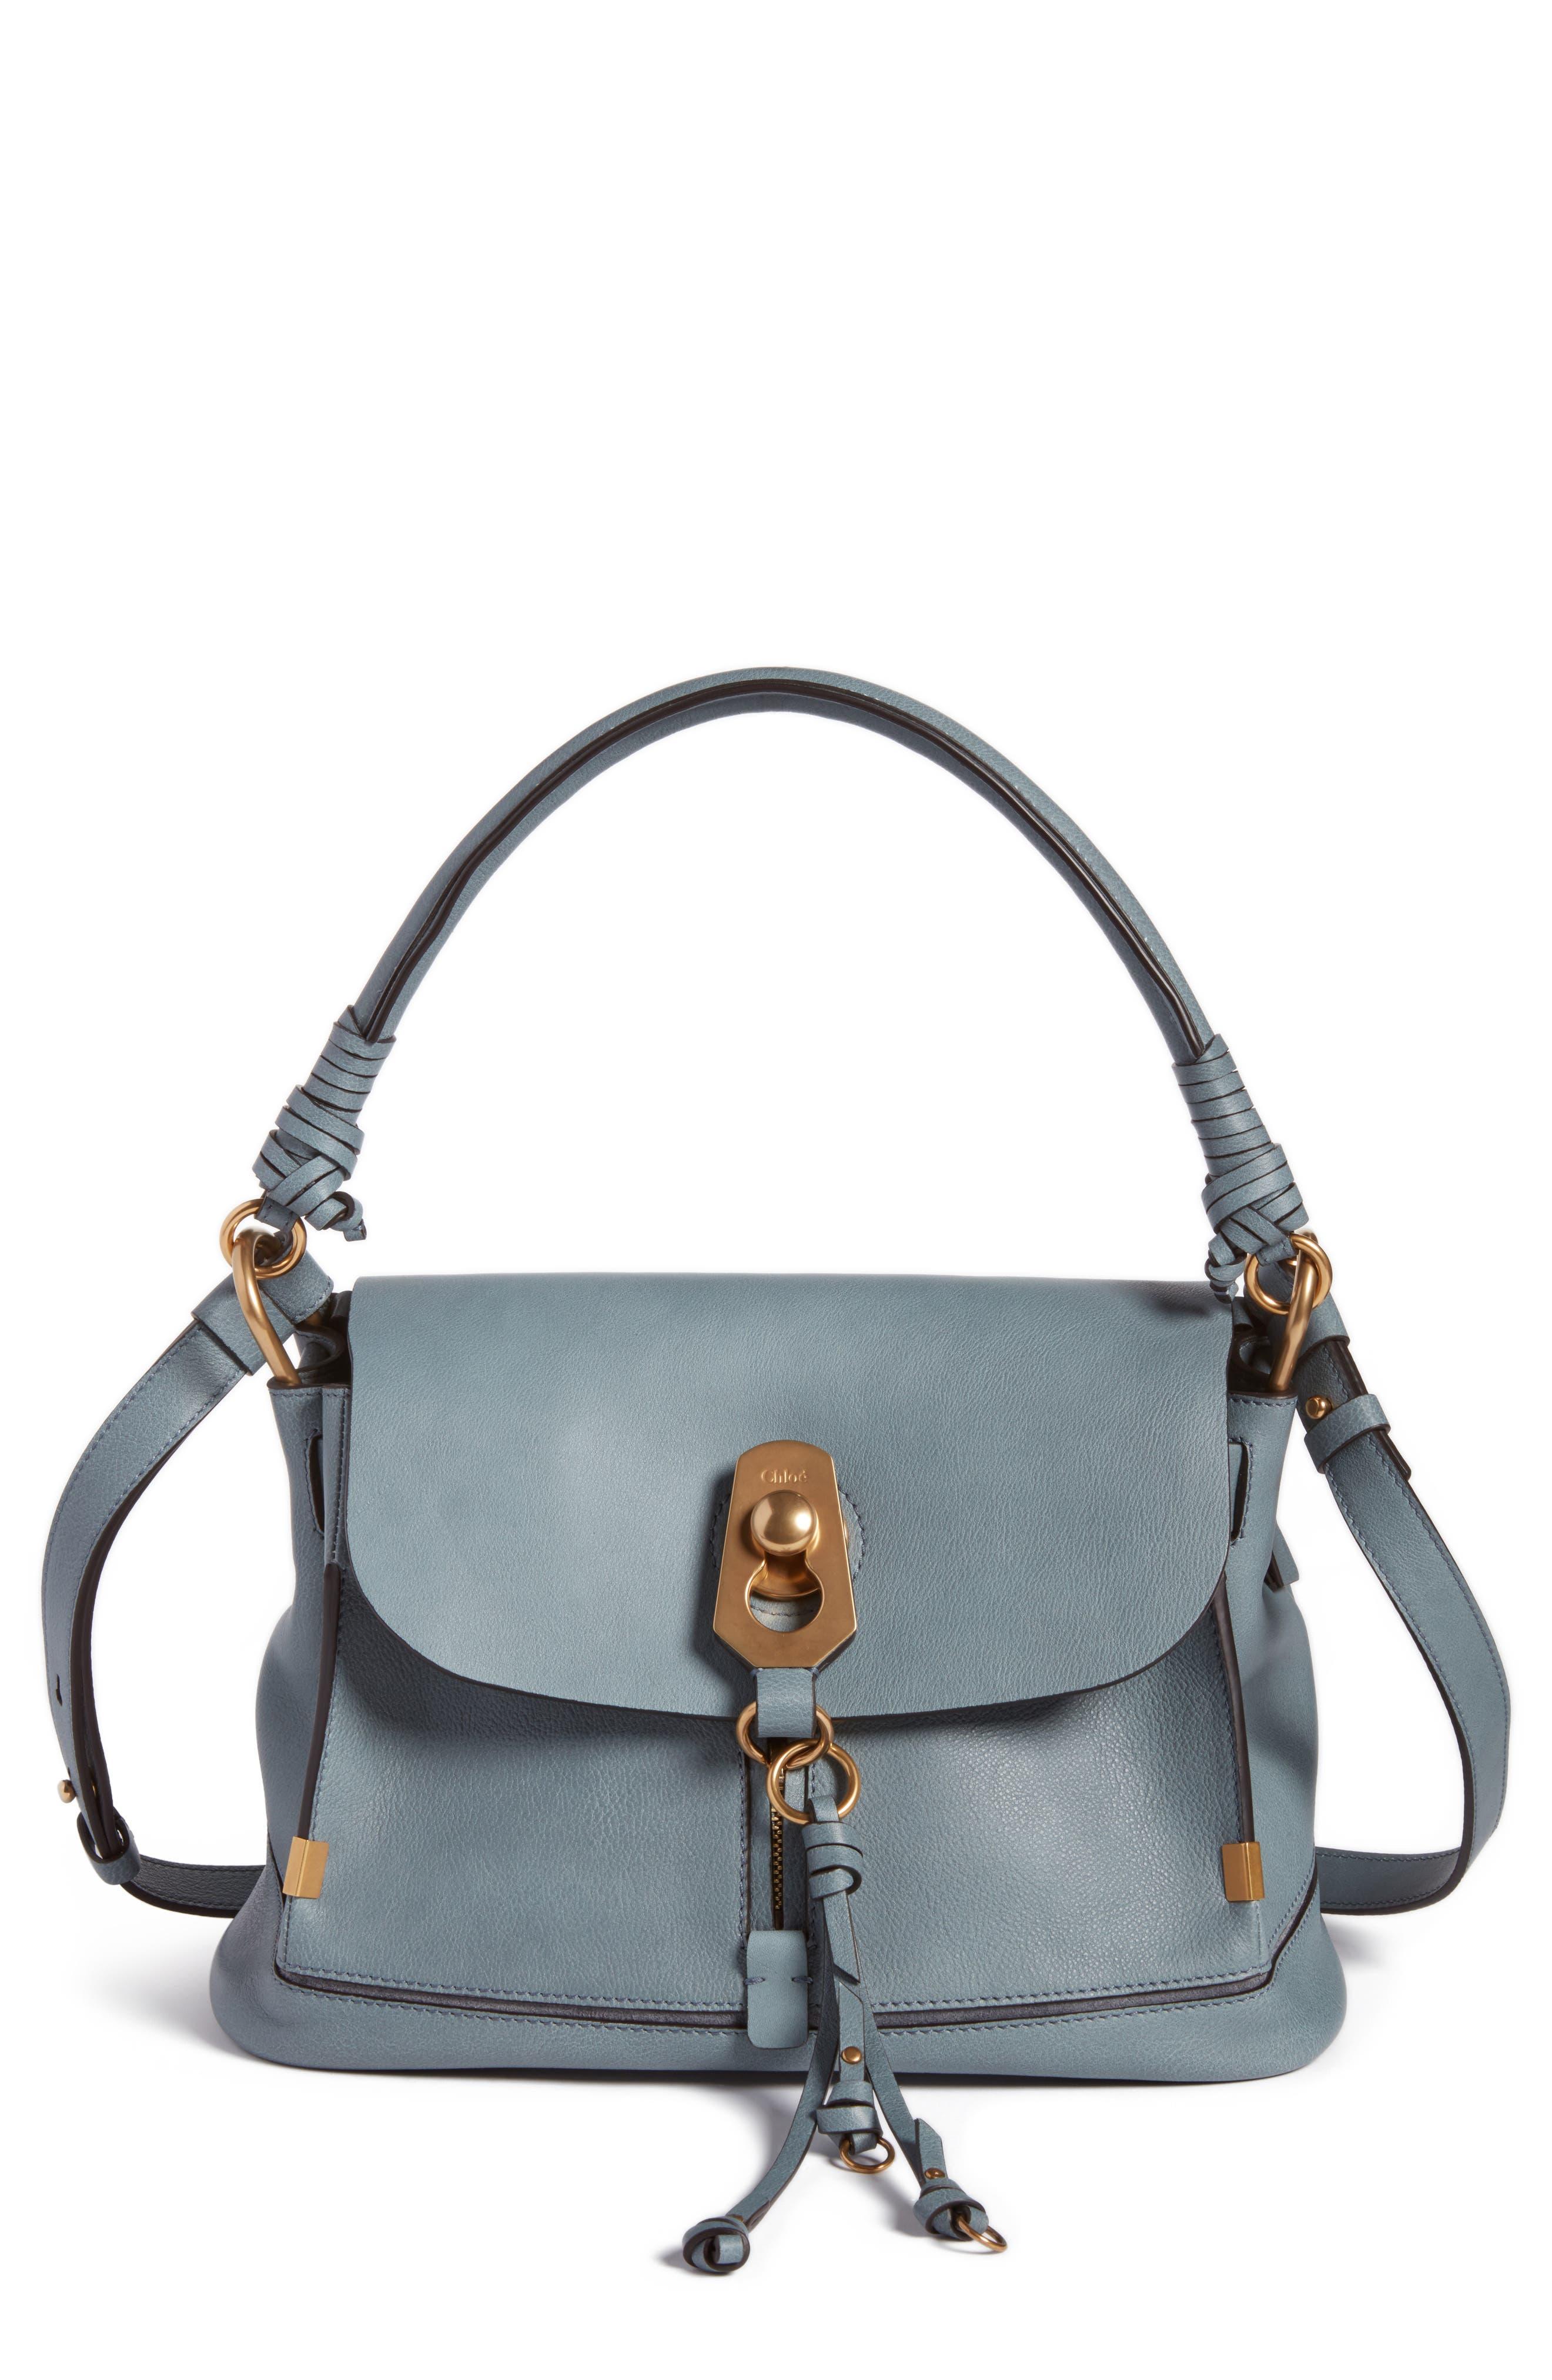 Chloé Small Owen Calfskin Leather Satchel